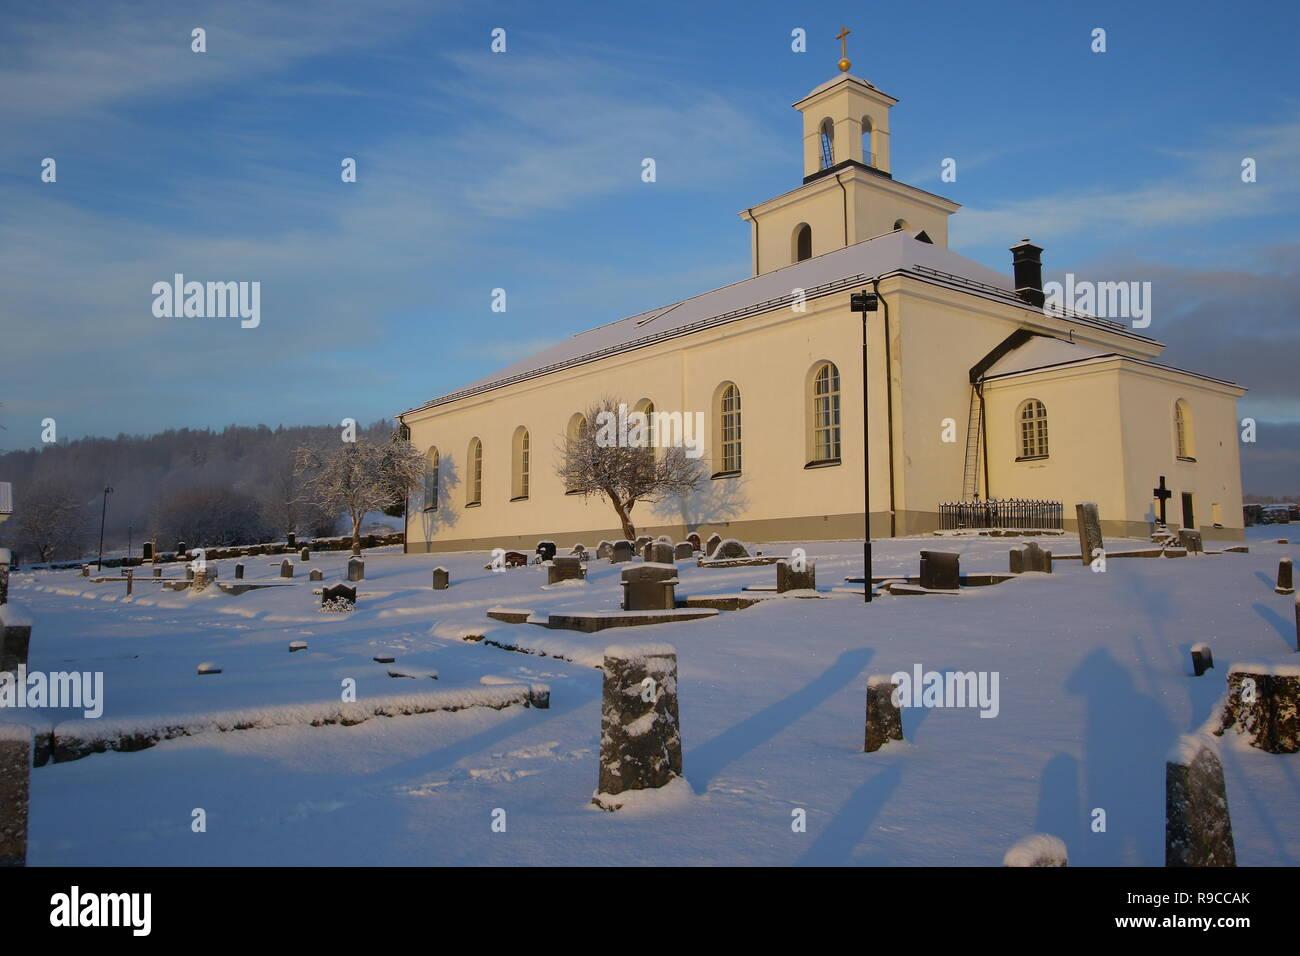 church in sweden höga kusten nordingra high coast - Stock Image